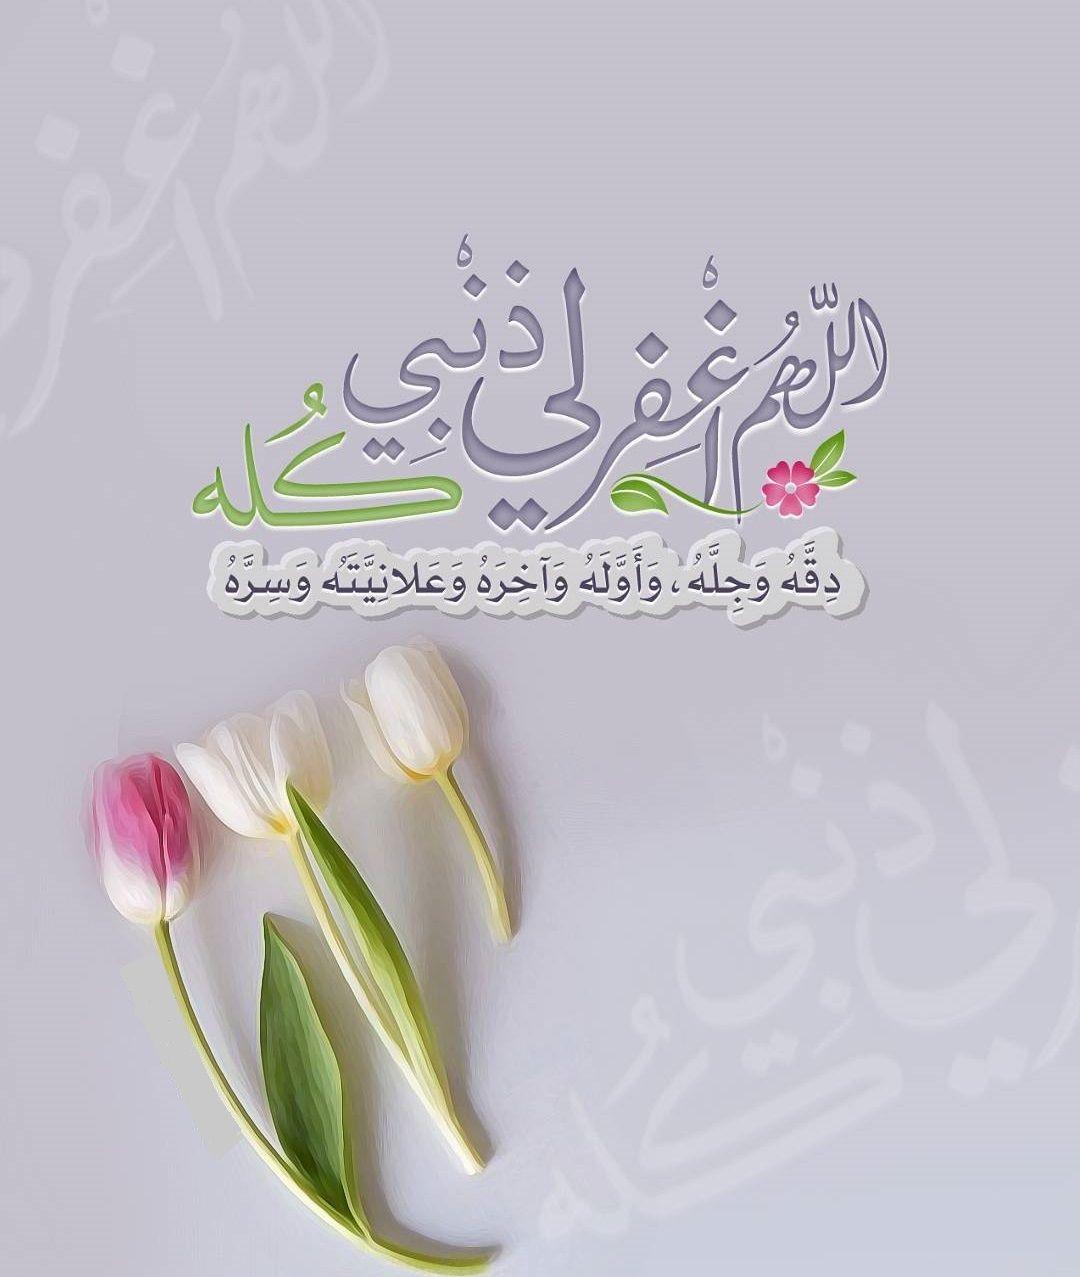 اللهم اغفر لي ذنبي كله ياكريم Islamic Pictures Learn Islam Islamic Calligraphy